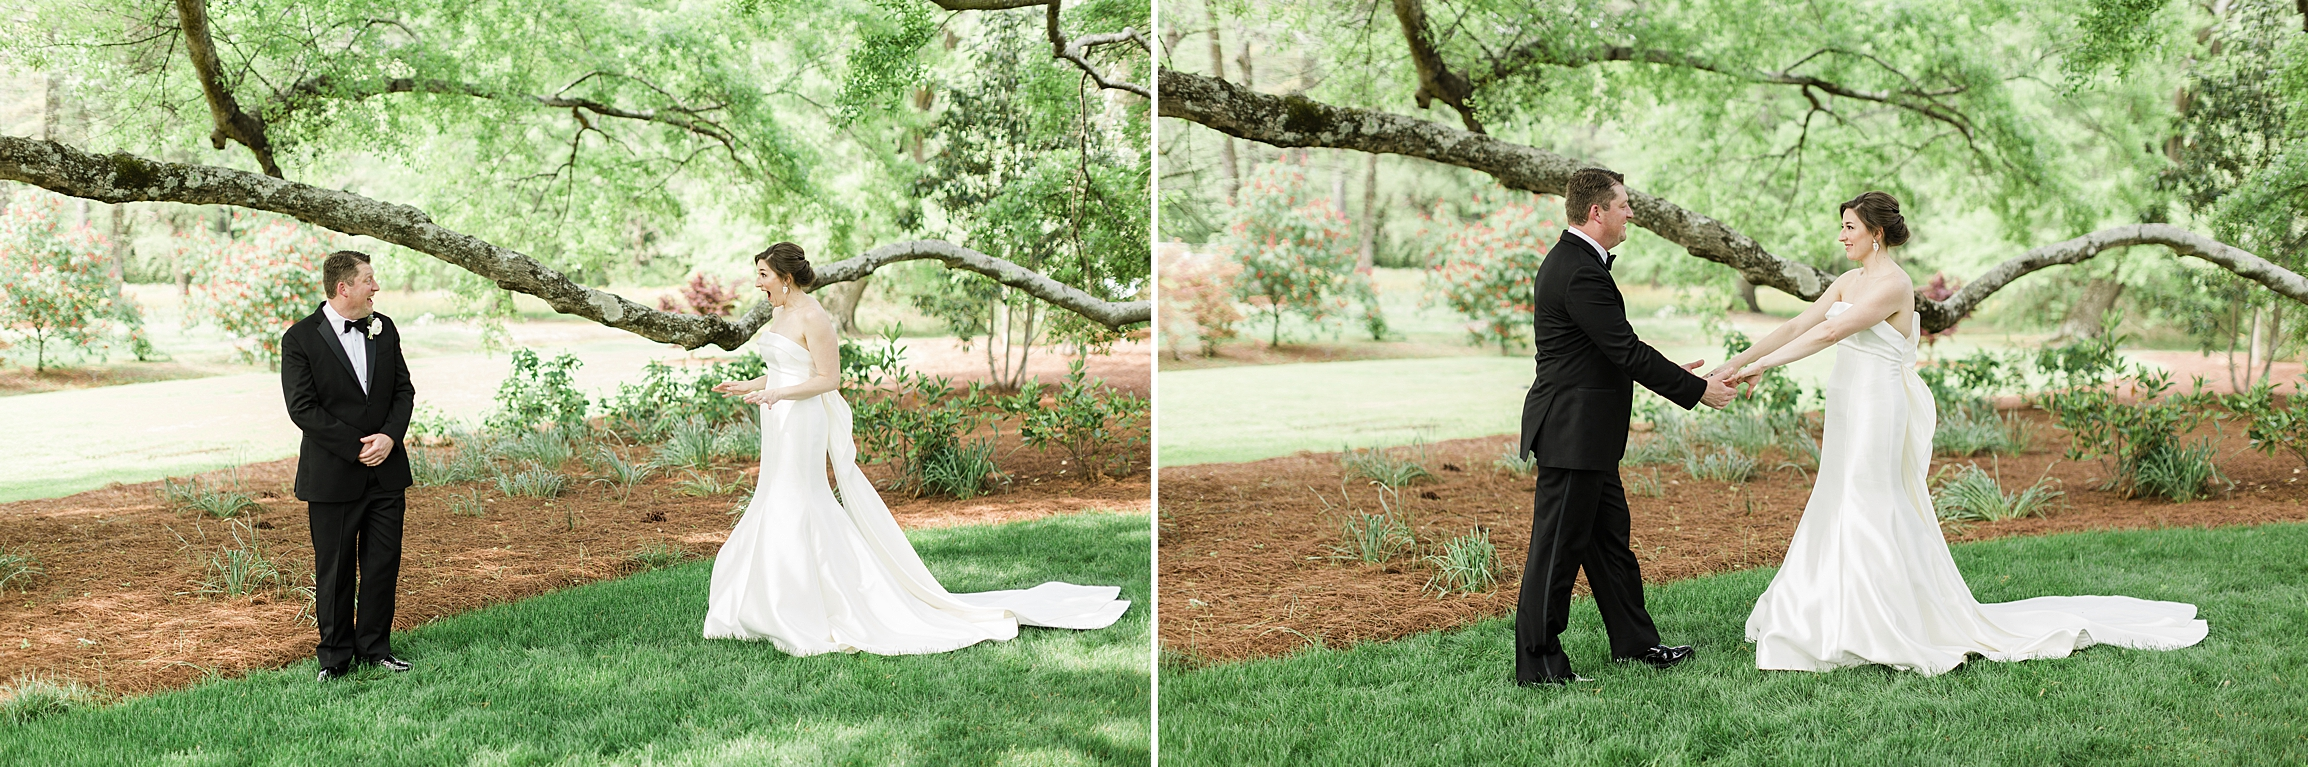 Alabama Wedding Potographer_0019.jpg